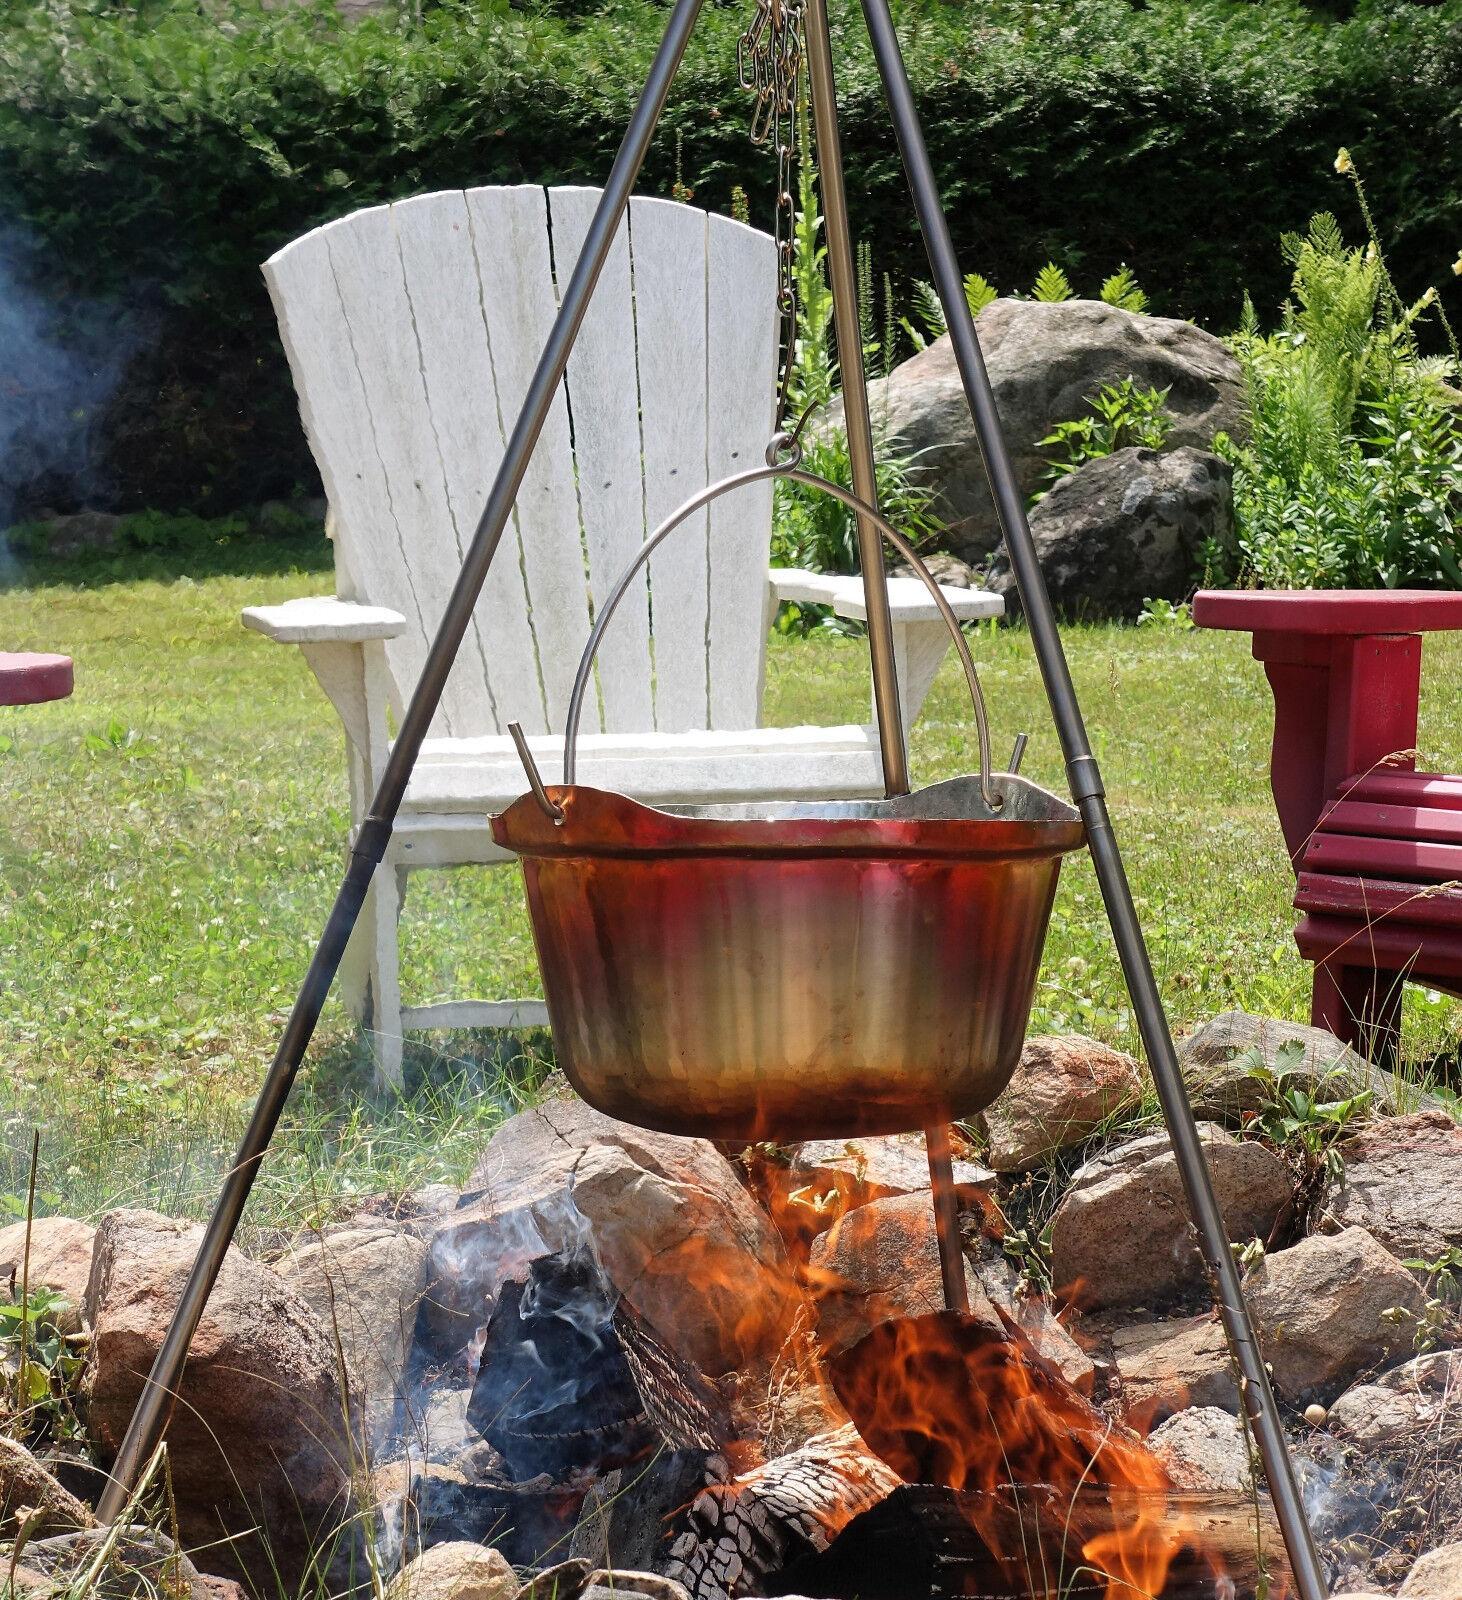 Handmade Copper Cauldron Picnic Kettle Pot Pot Pot Campfire Cooking Tripod 15 Lit 4 Gal 900188